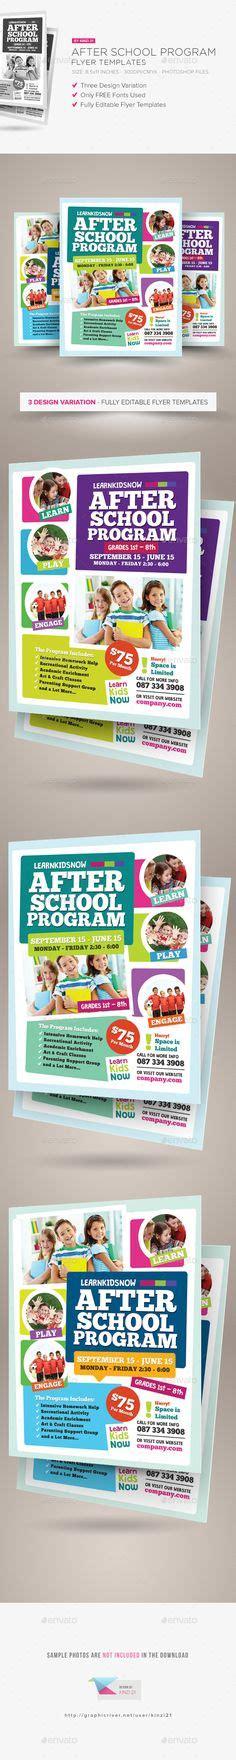 Kindergarten Flyer Ad Microsoft Word Template Publisher Template Brochure Pinterest Curriculum Flyer Template